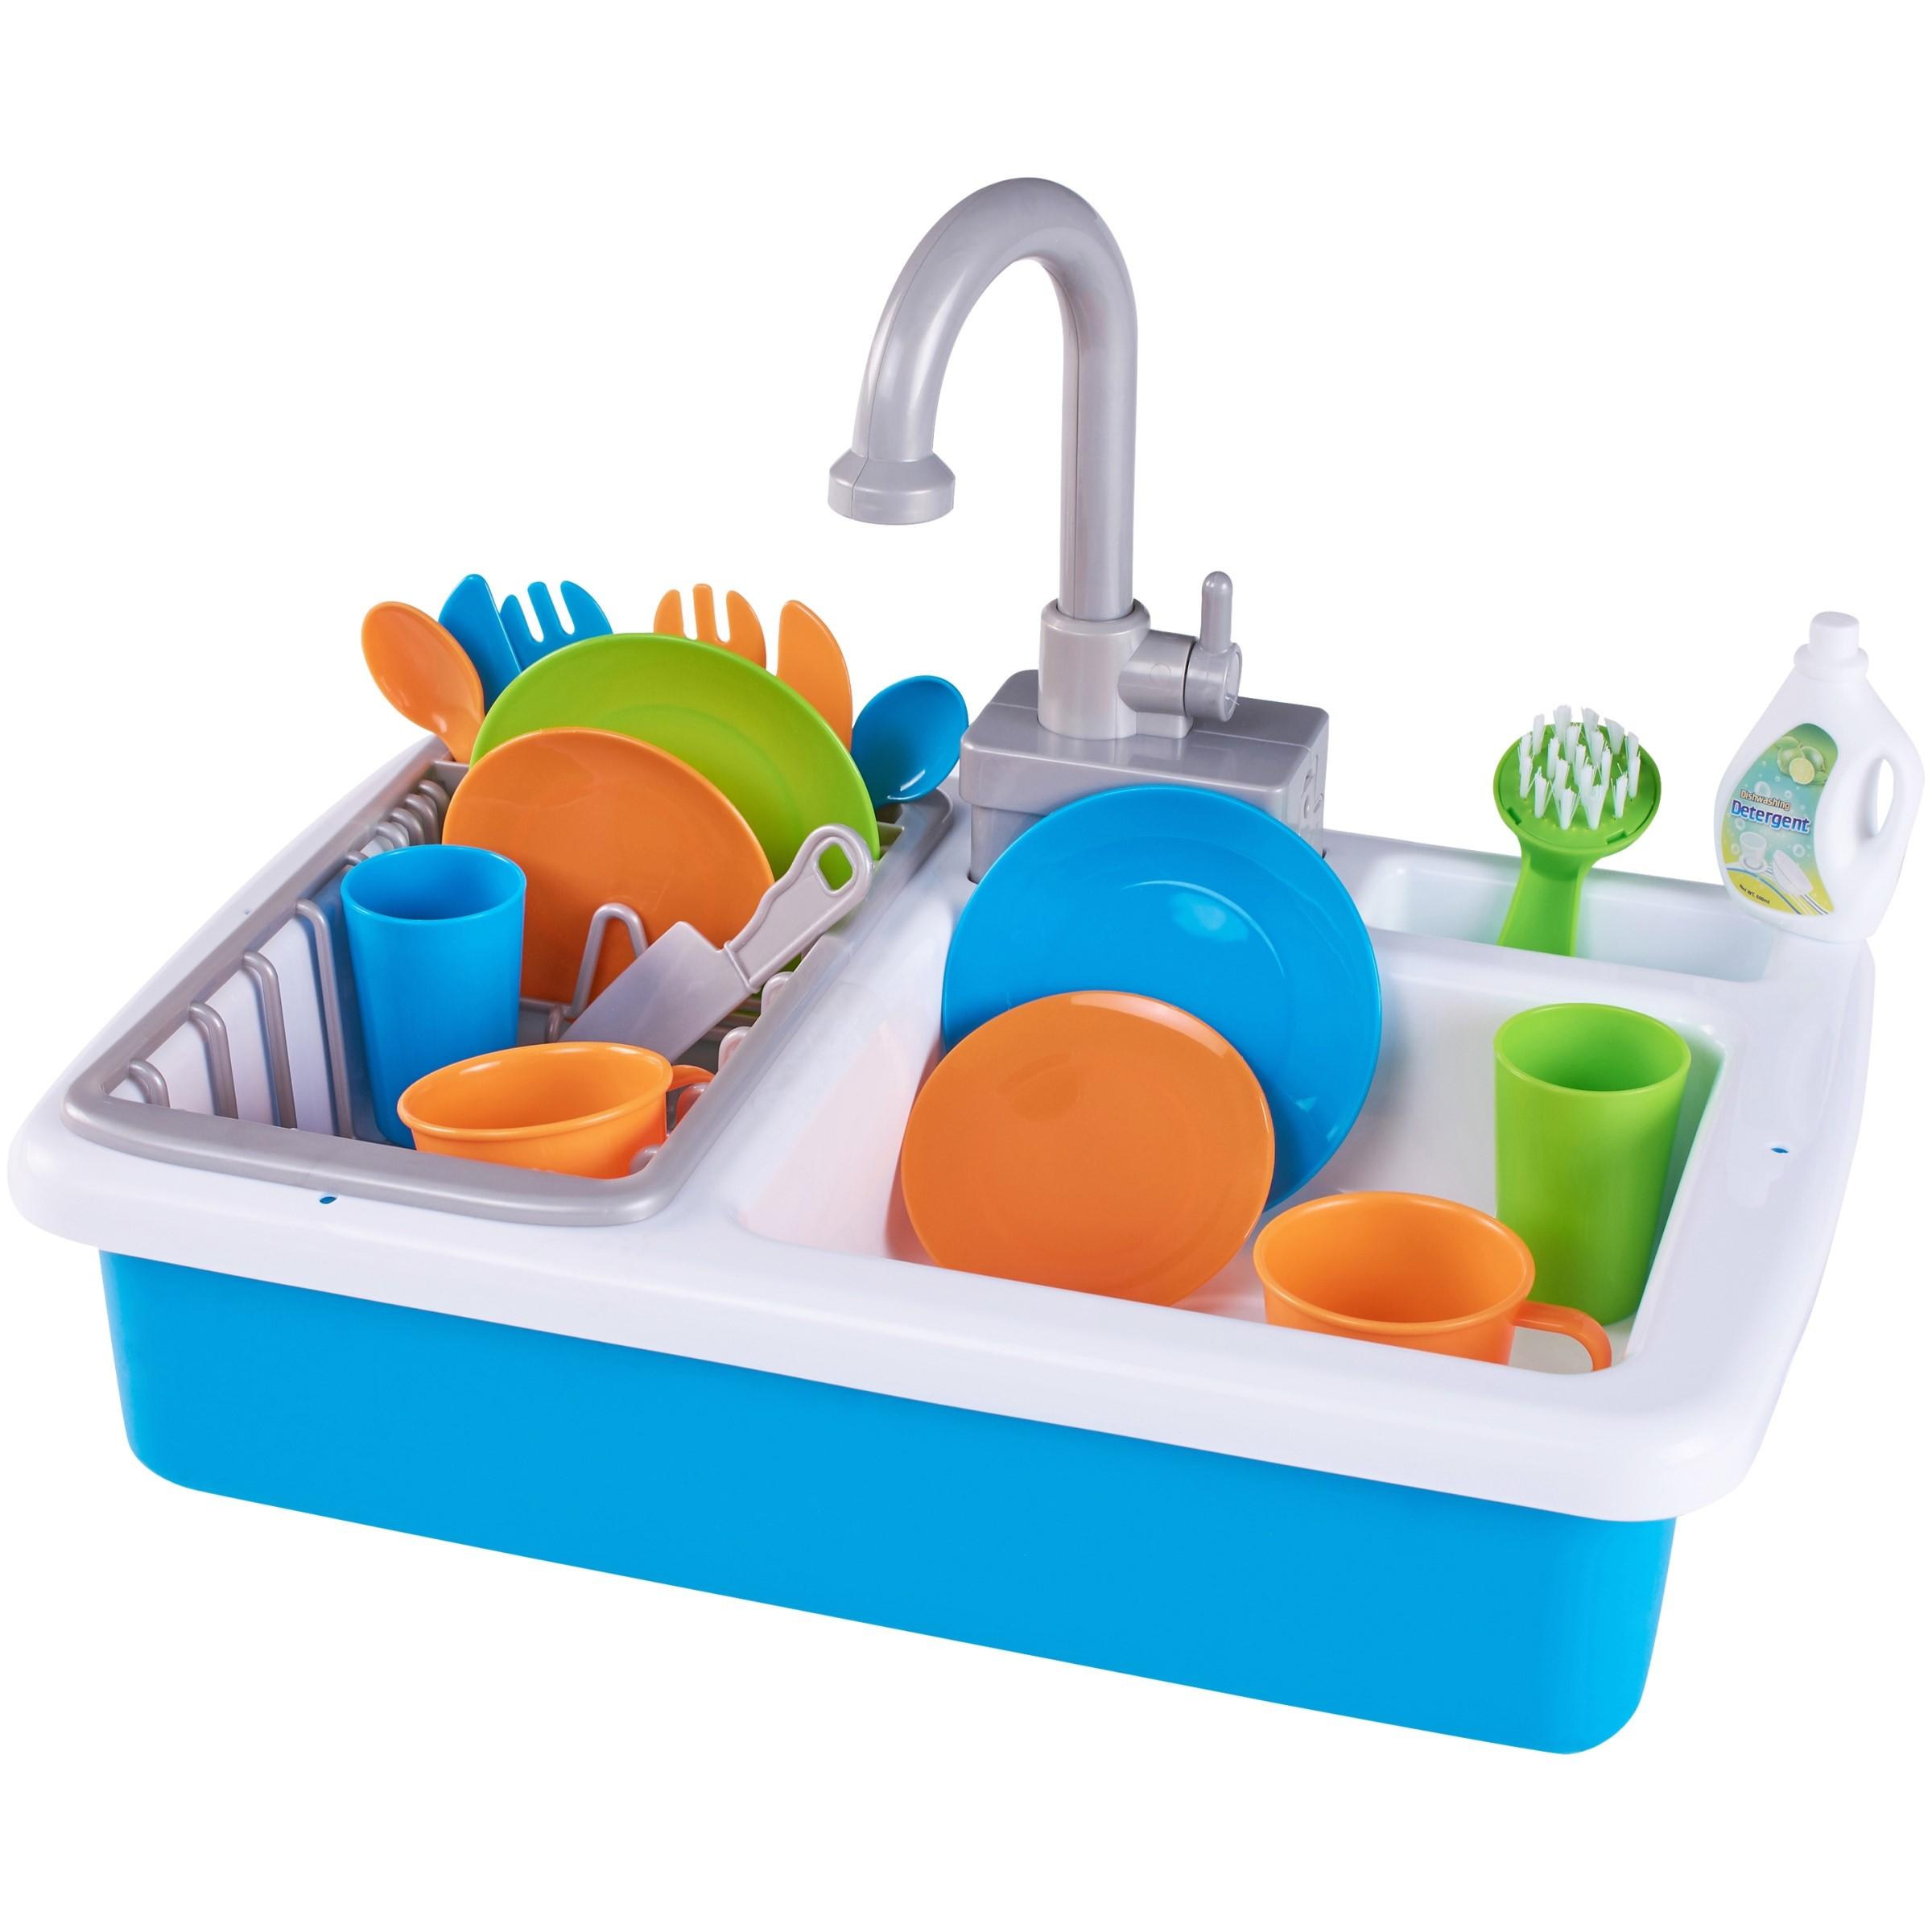 Superbe Kidsu0027 Play Sinks